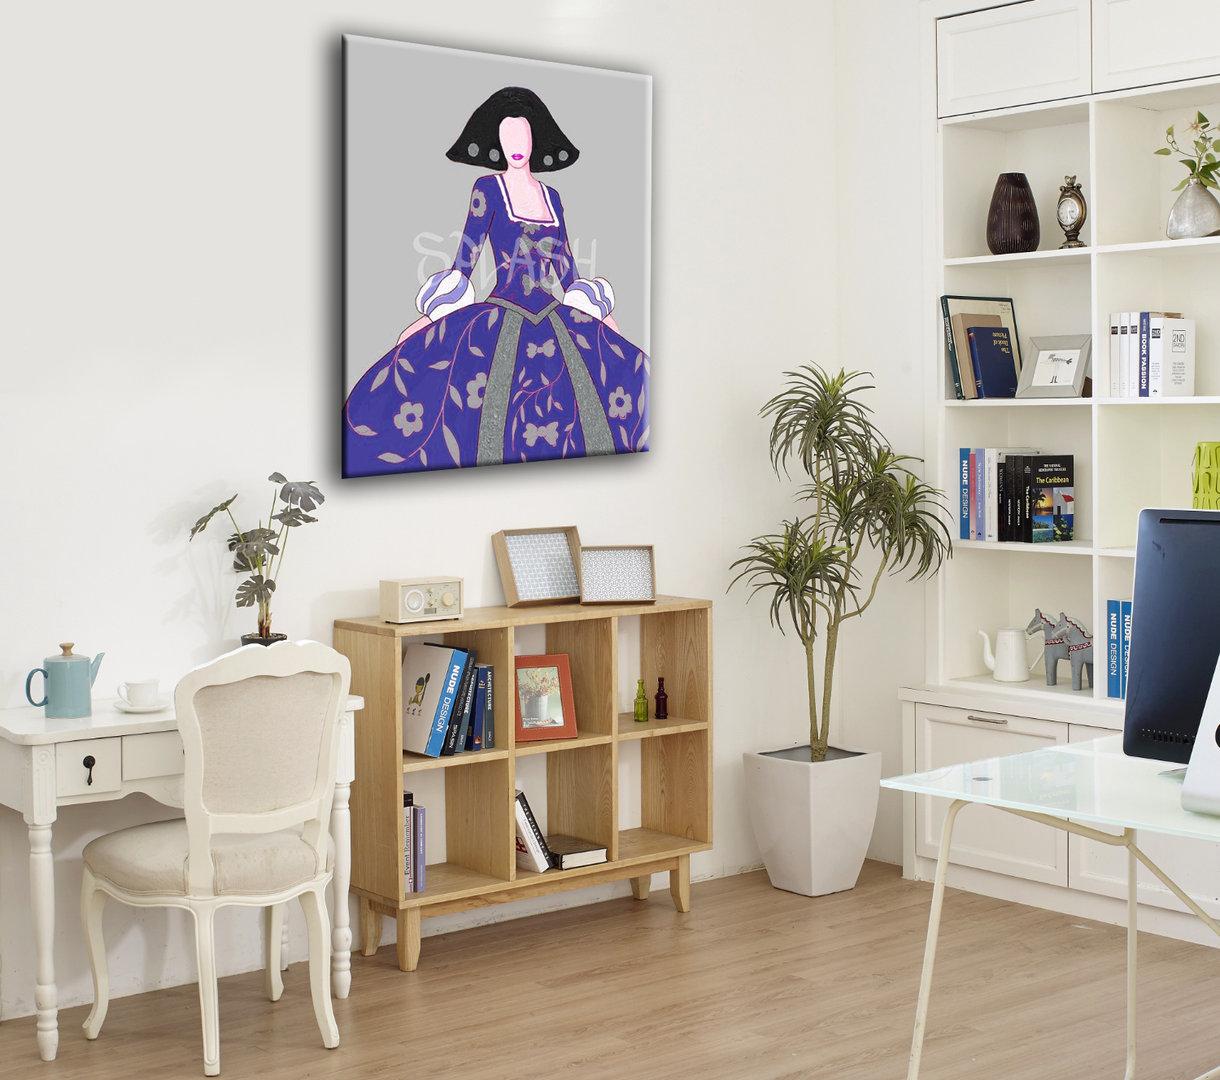 Cuadros meninas modernas azul plata tienda de cuadros Comprar cuadros modernos baratos online